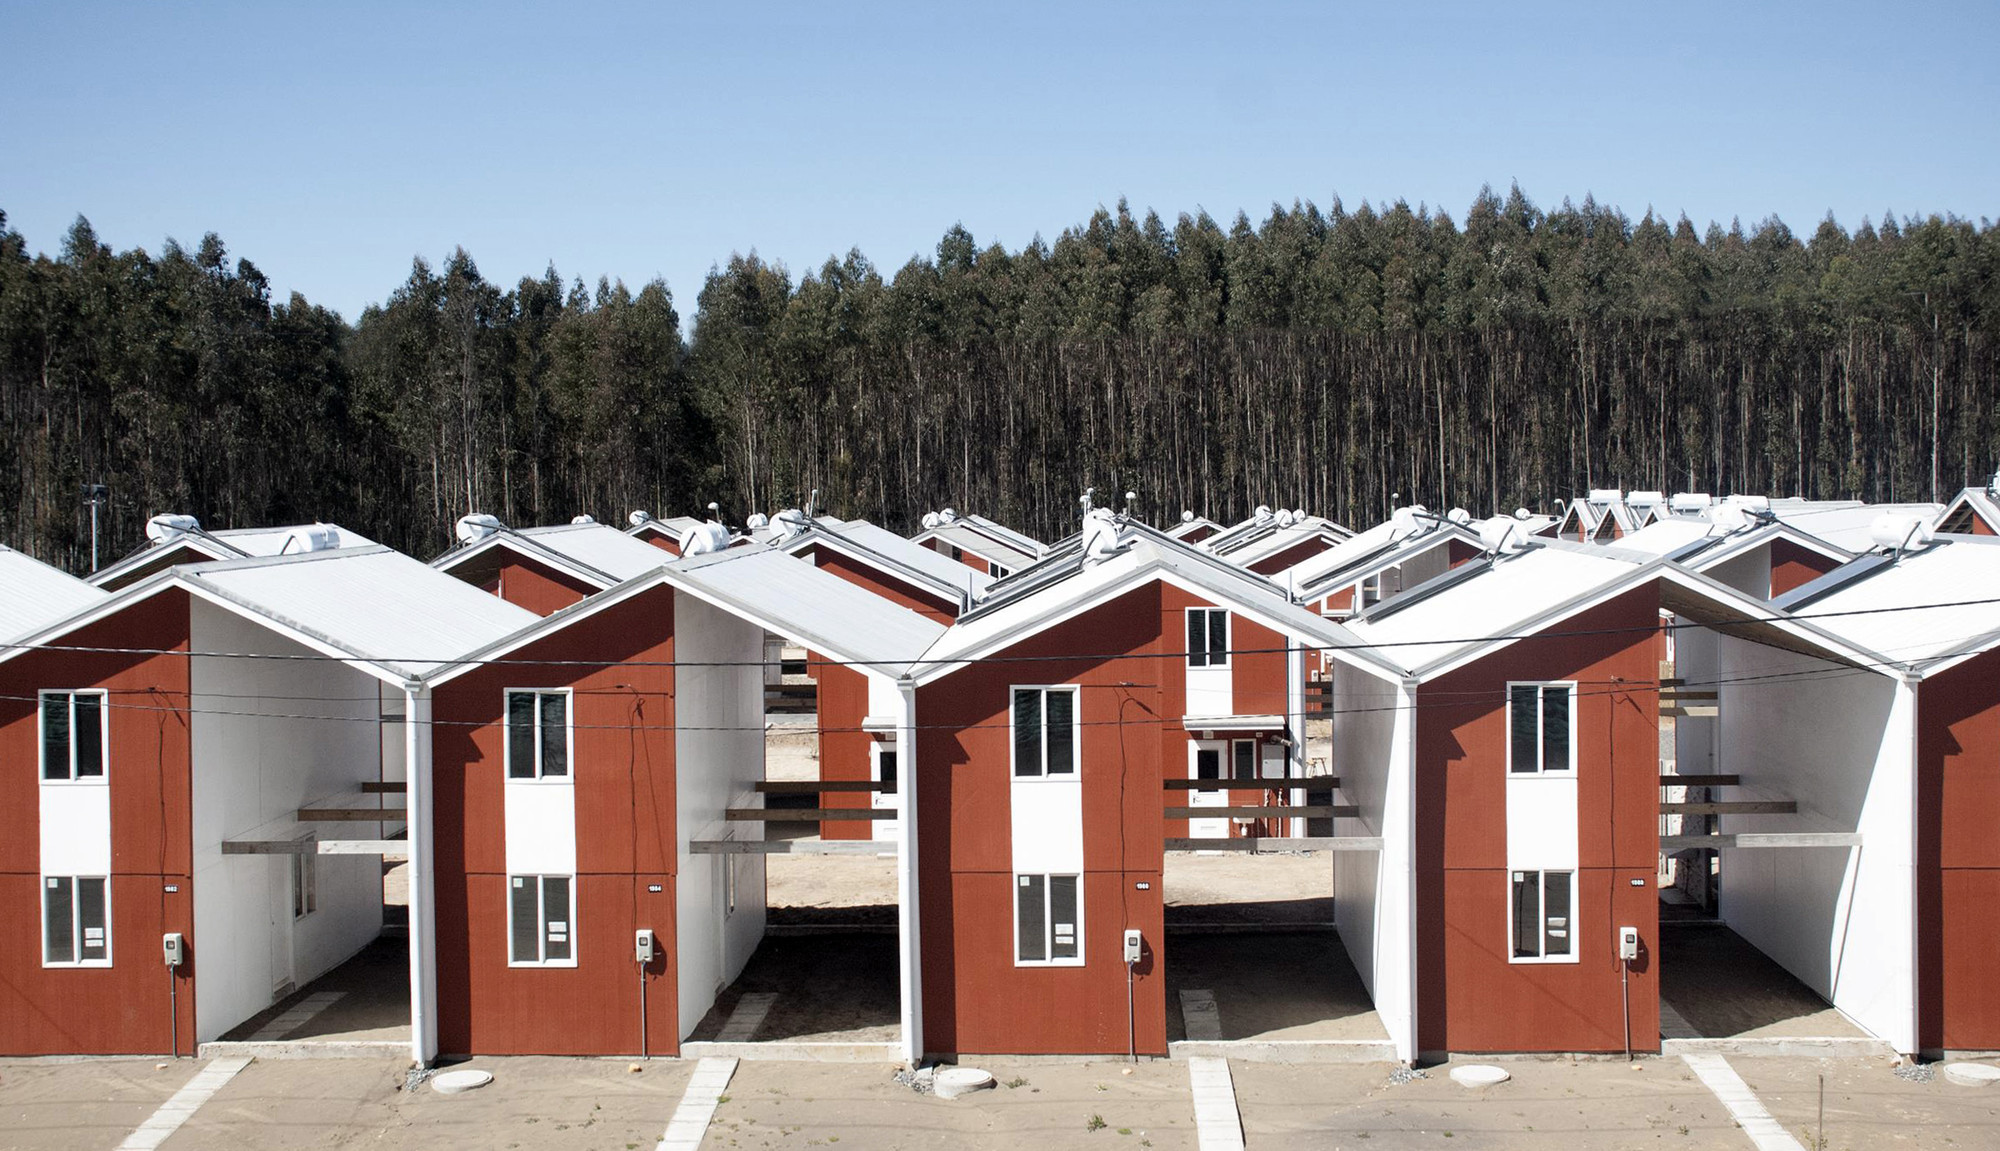 Villa Verde Housing Elemental Archdaily